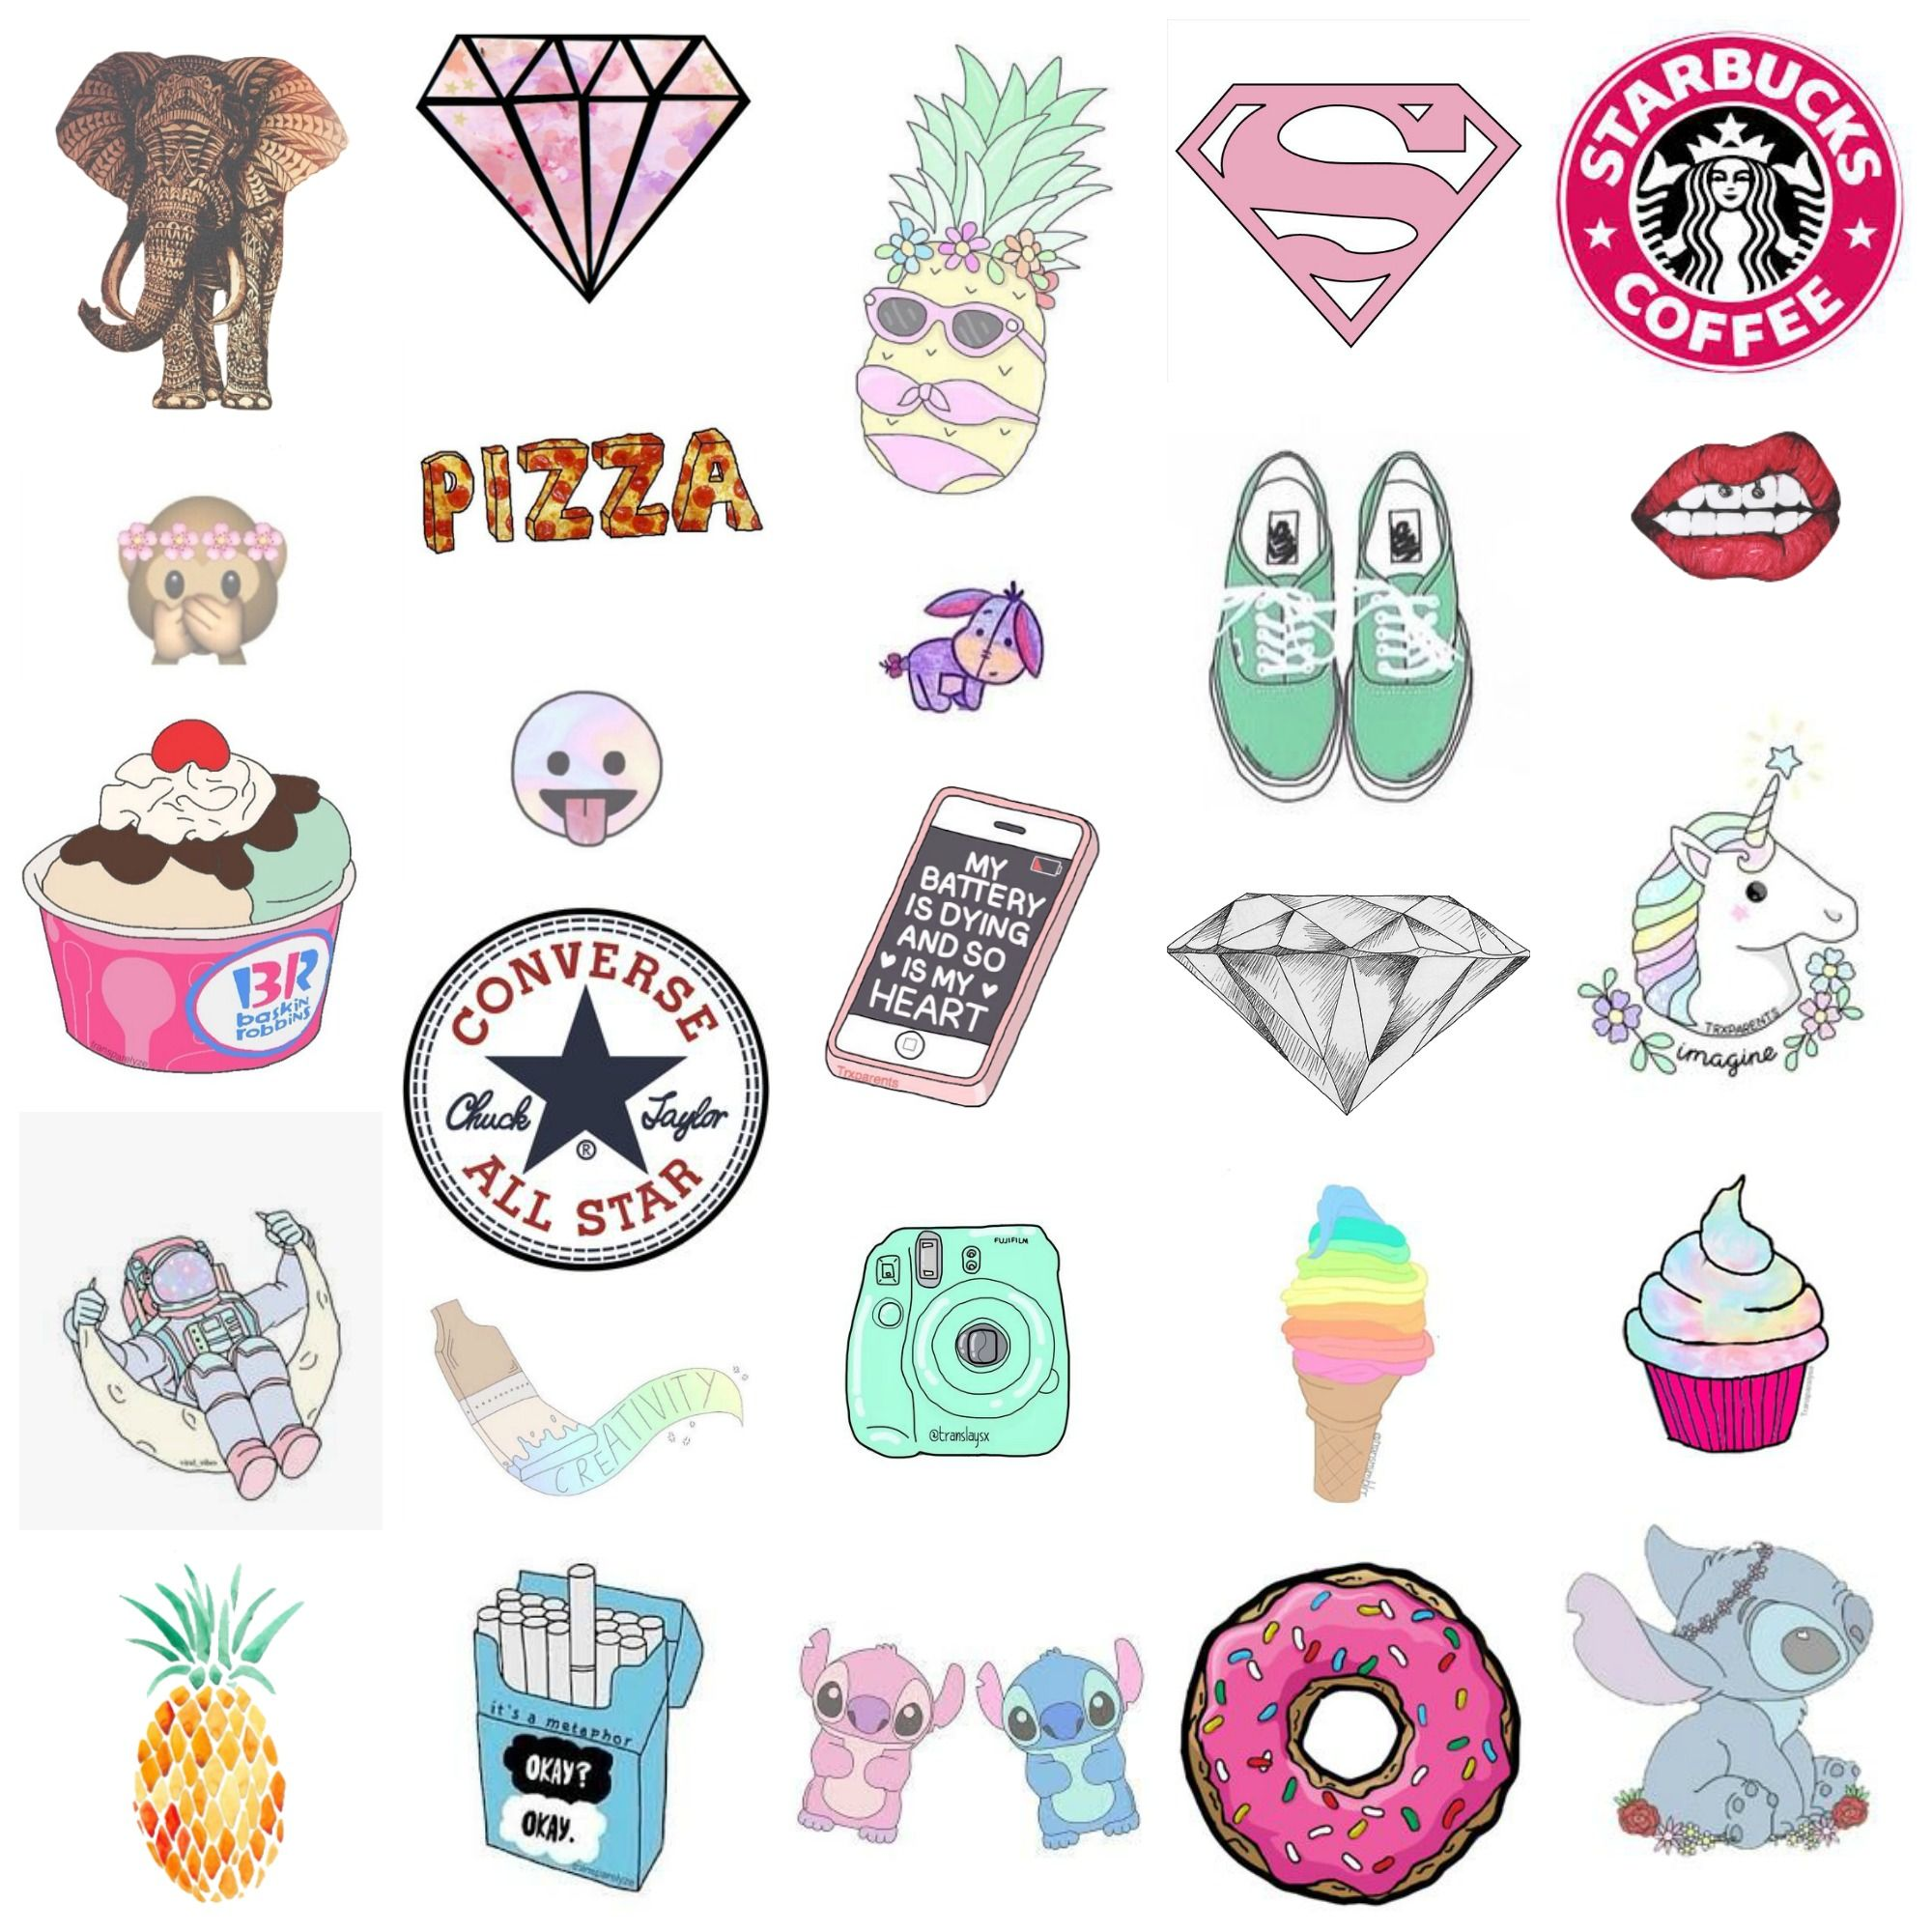 Pin by Kaelyn on Gucci | Tumblr stickers, Diy school ...